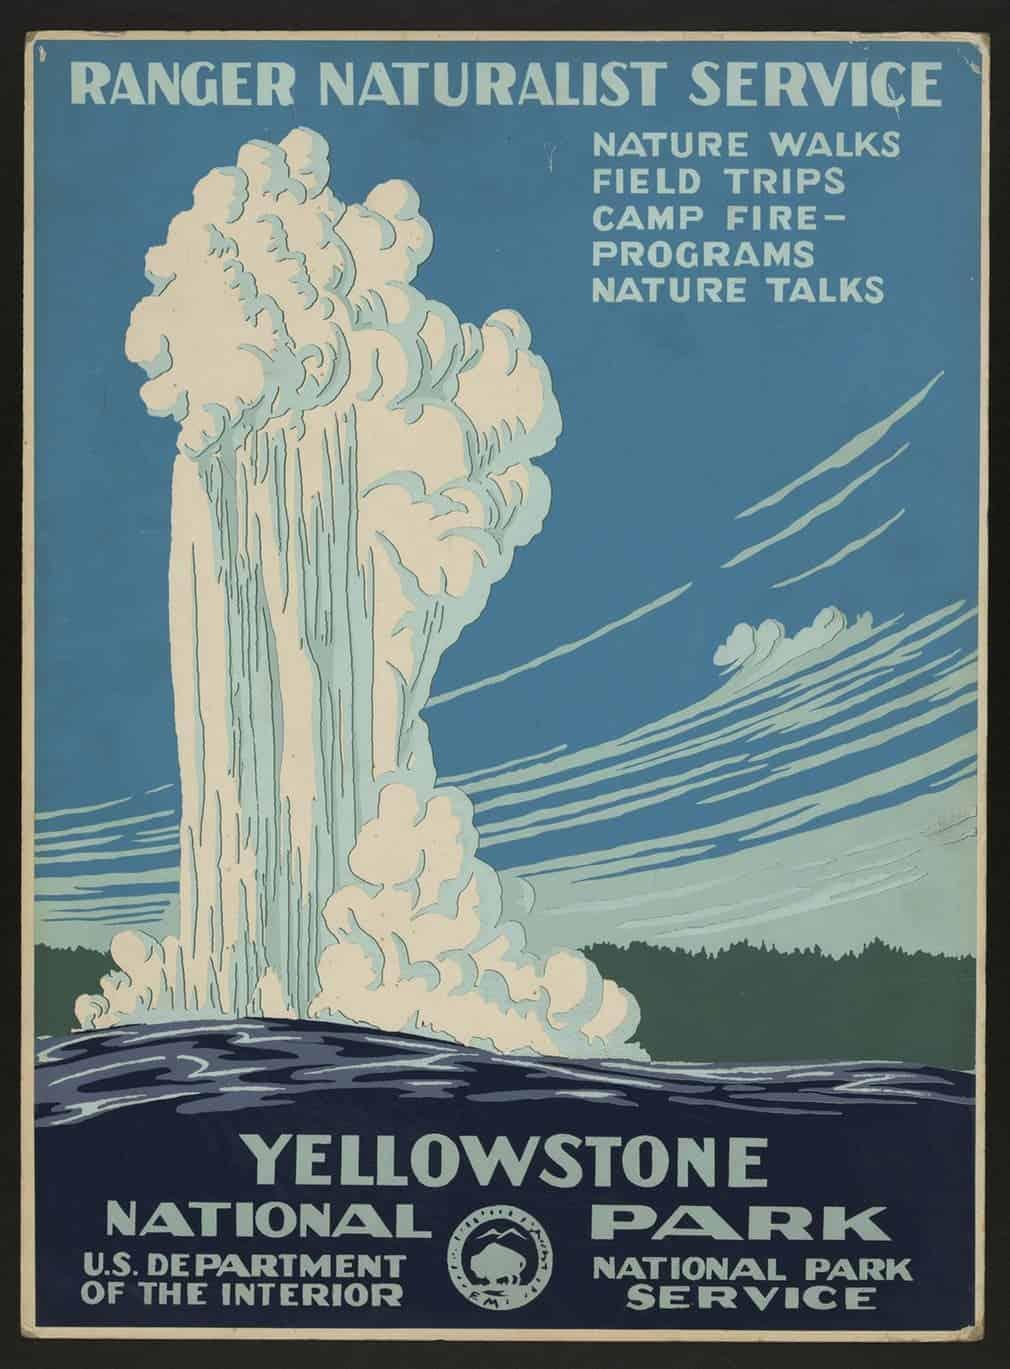 Old Faithful erupting at Yellowstone national park, circa 1938